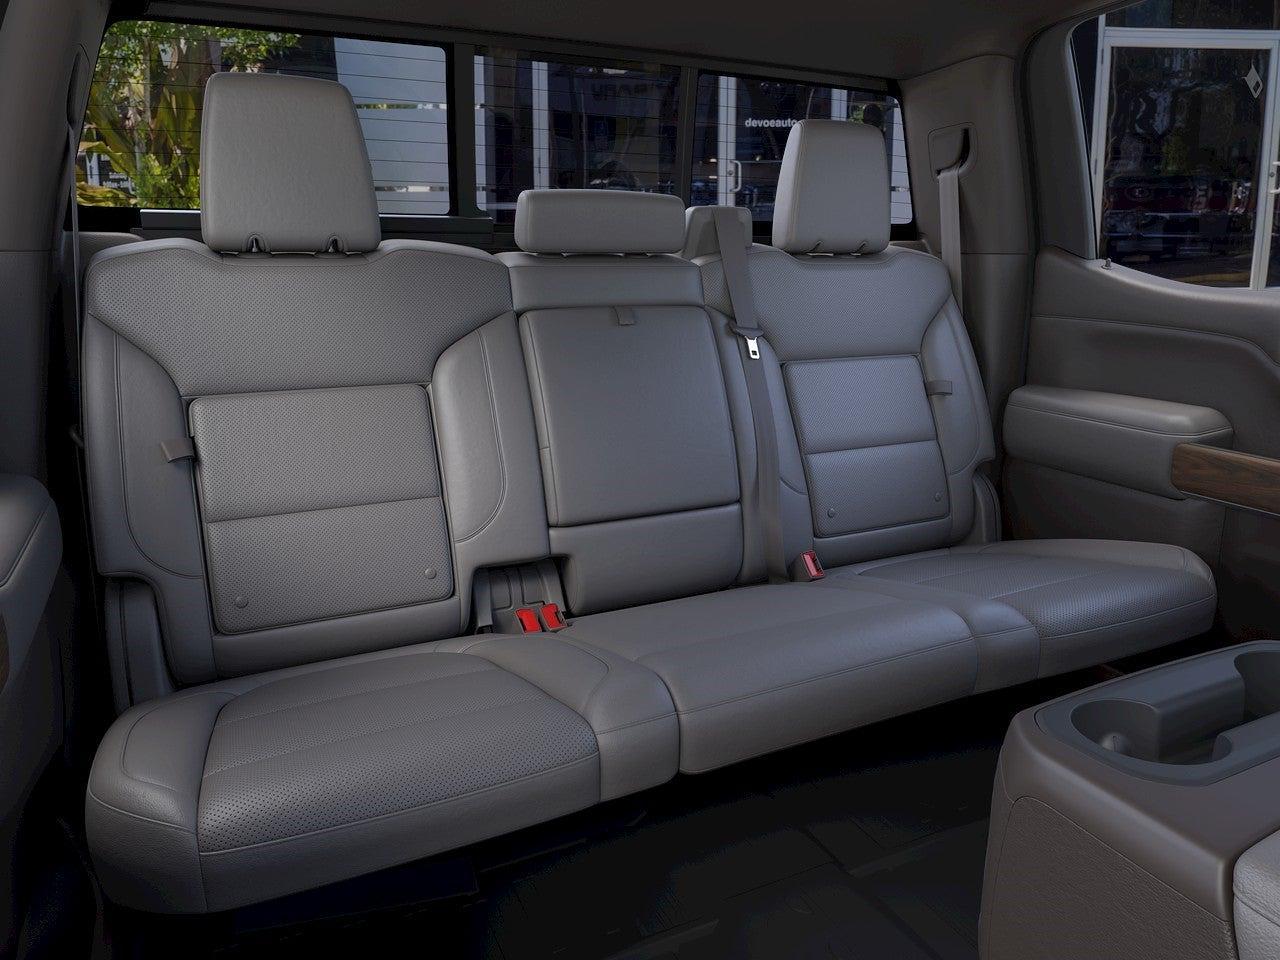 2021 GMC Sierra 1500 Crew Cab 4x4, Pickup #T21443 - photo 34